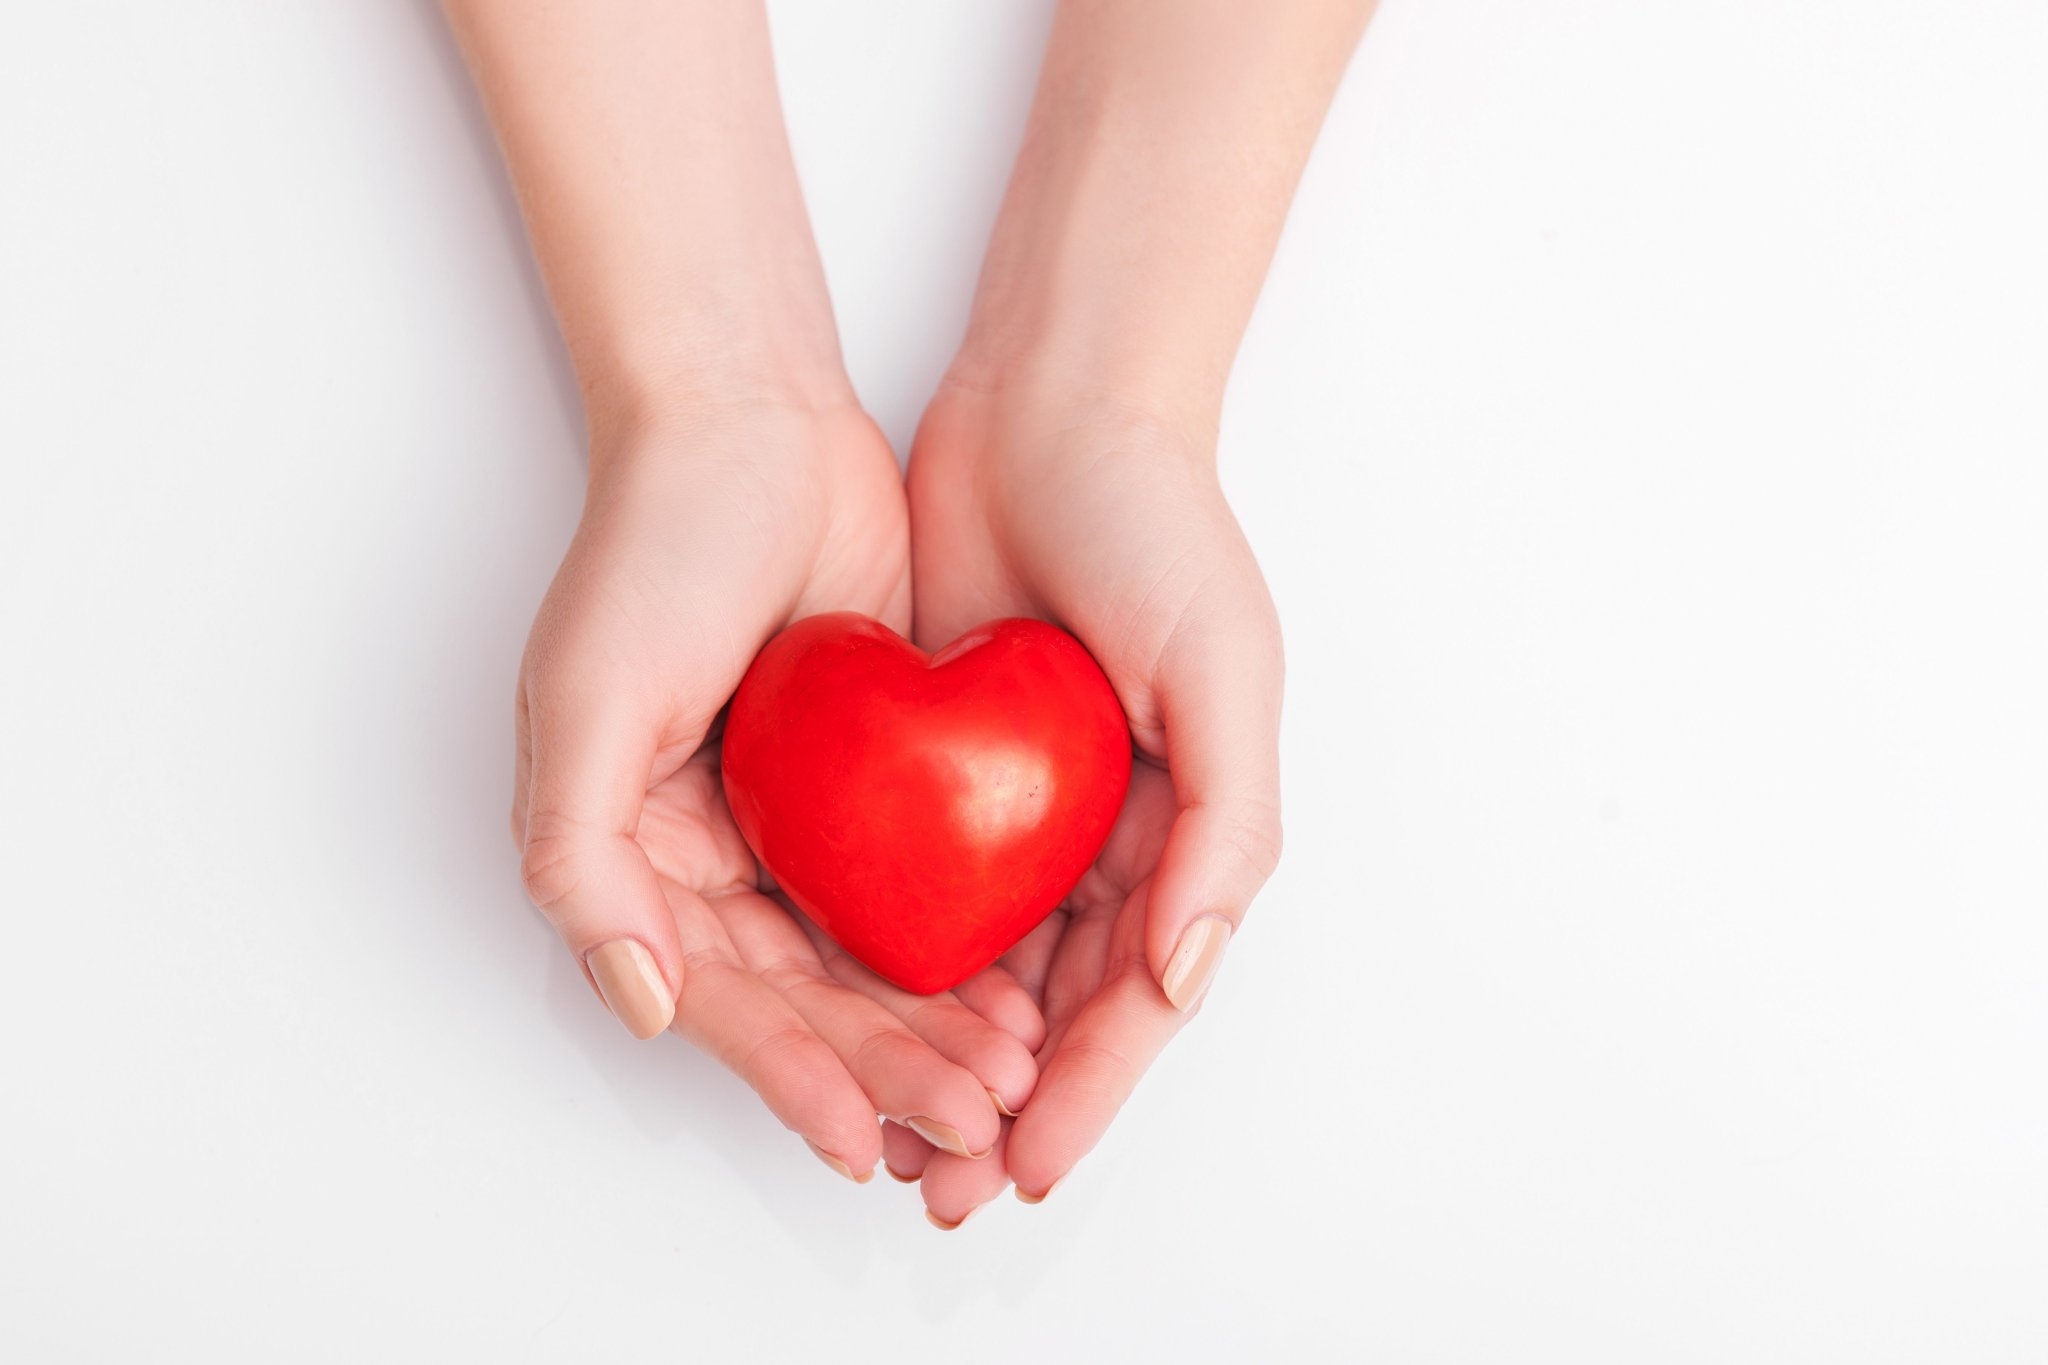 Symptoms of Heart Disease You Shouldn't Ignore